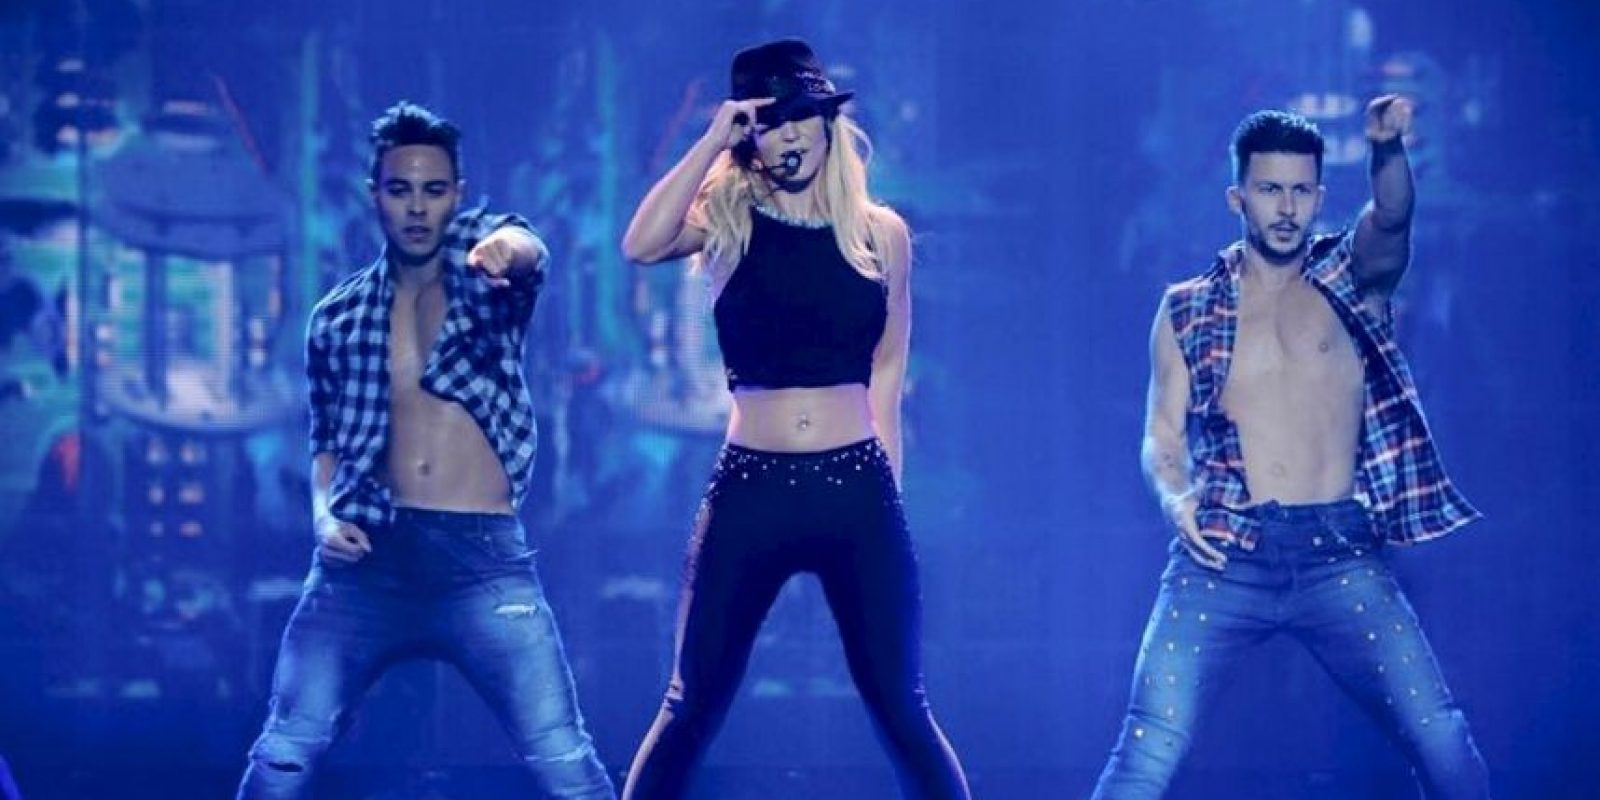 Britney Spears Foto:Vís facebook.com/britneyspears